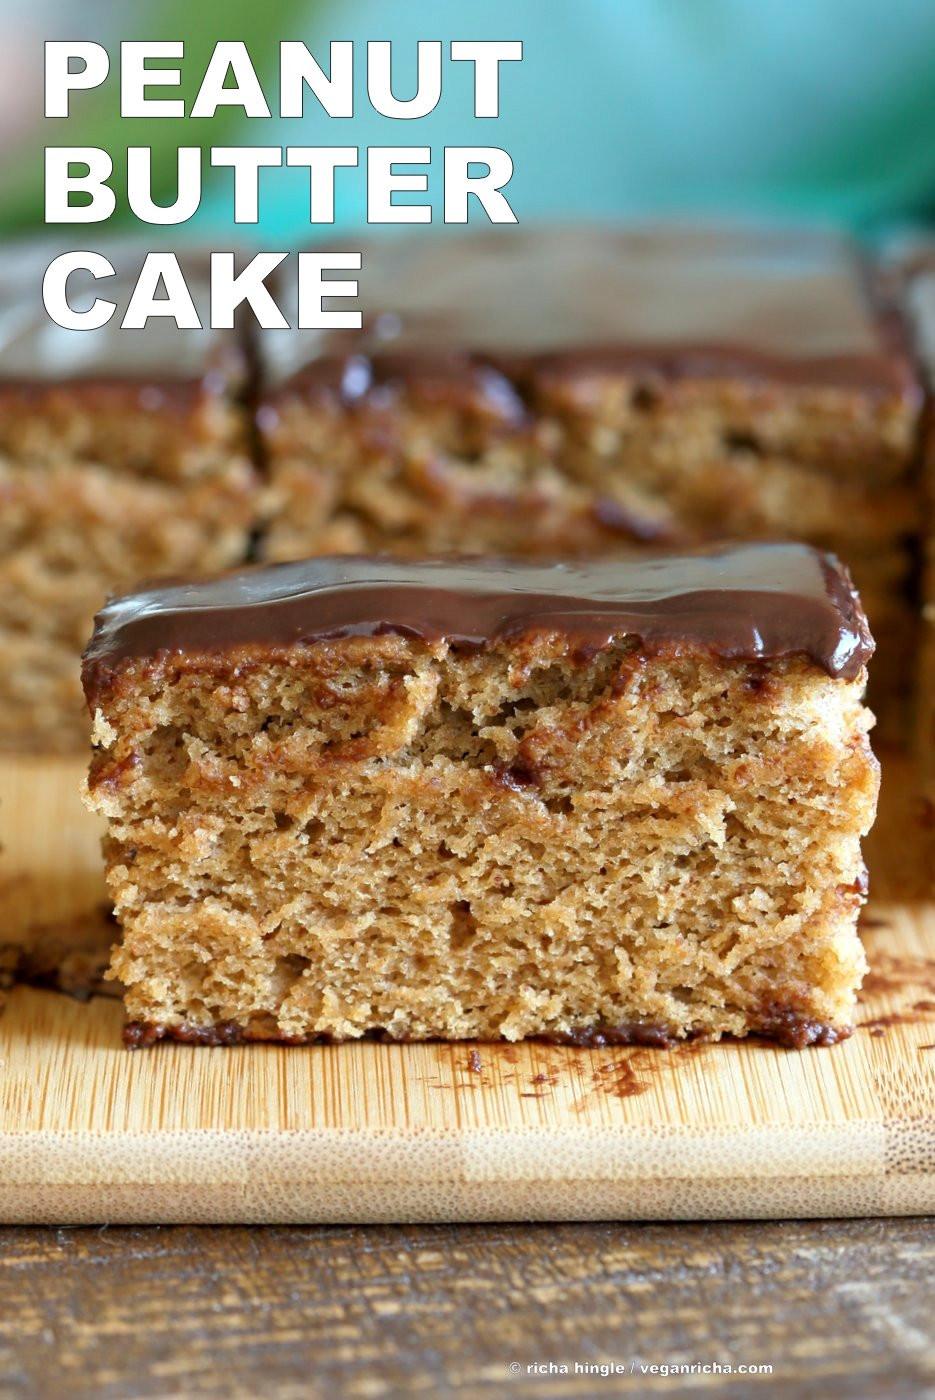 Vegan Cake Recipe Easy  Vegan Peanut Butter Cake with Chocolate Peanut Butter